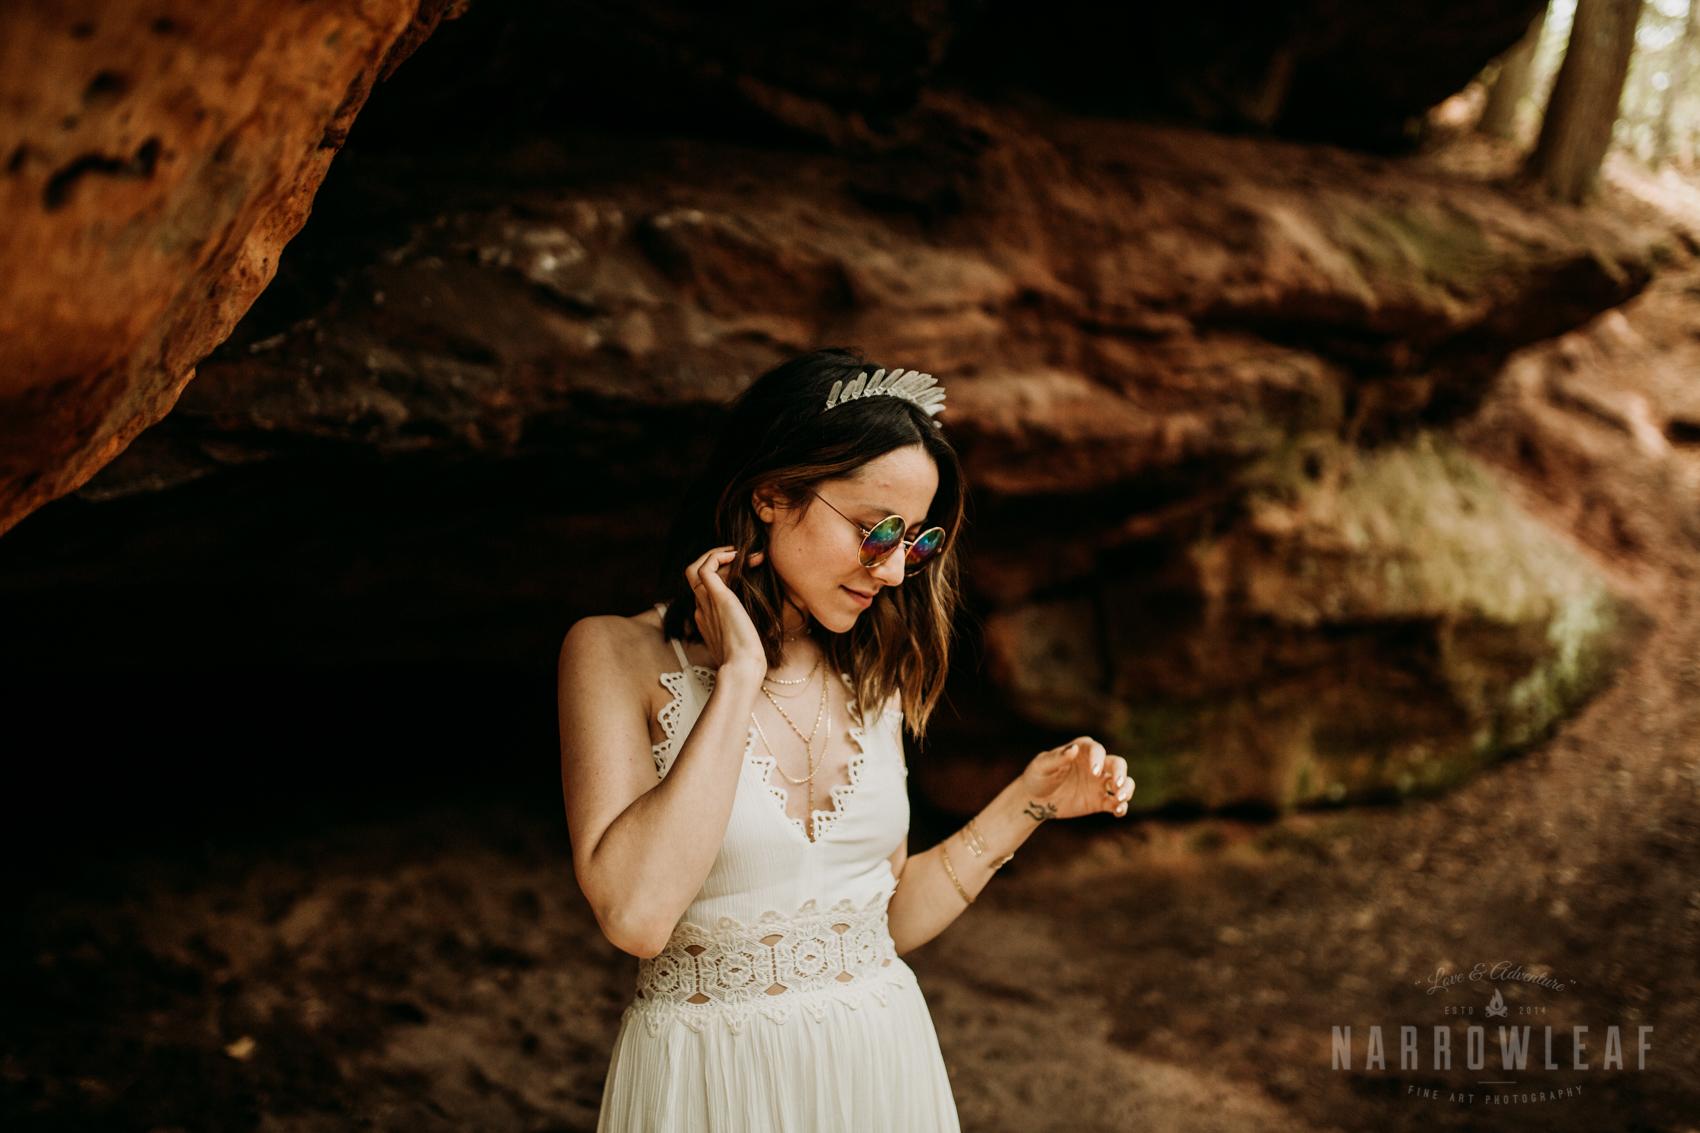 moody-lake-superior-hiking-adventure-elopement-NarrowLeaf-Photography-7045.jpg